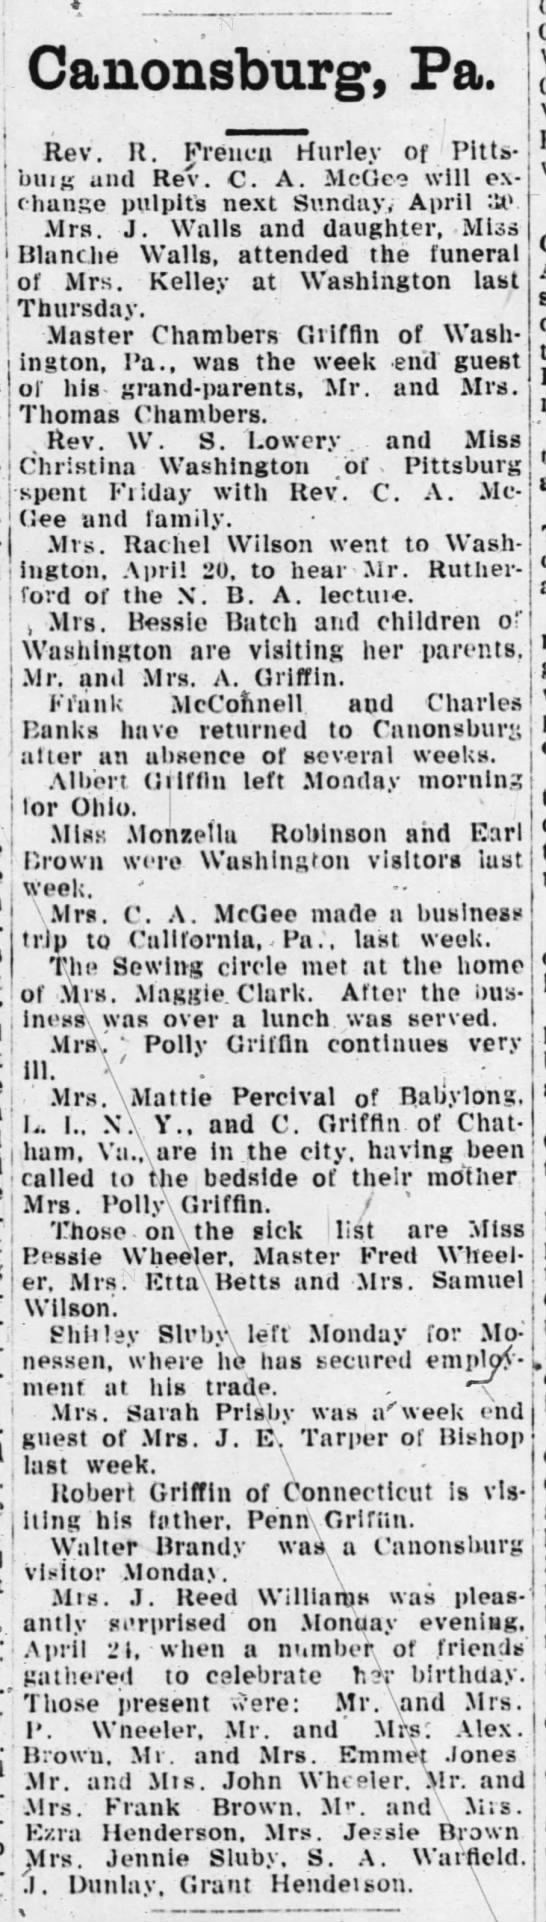 Griffins social 29 Apr 1911 TPC -